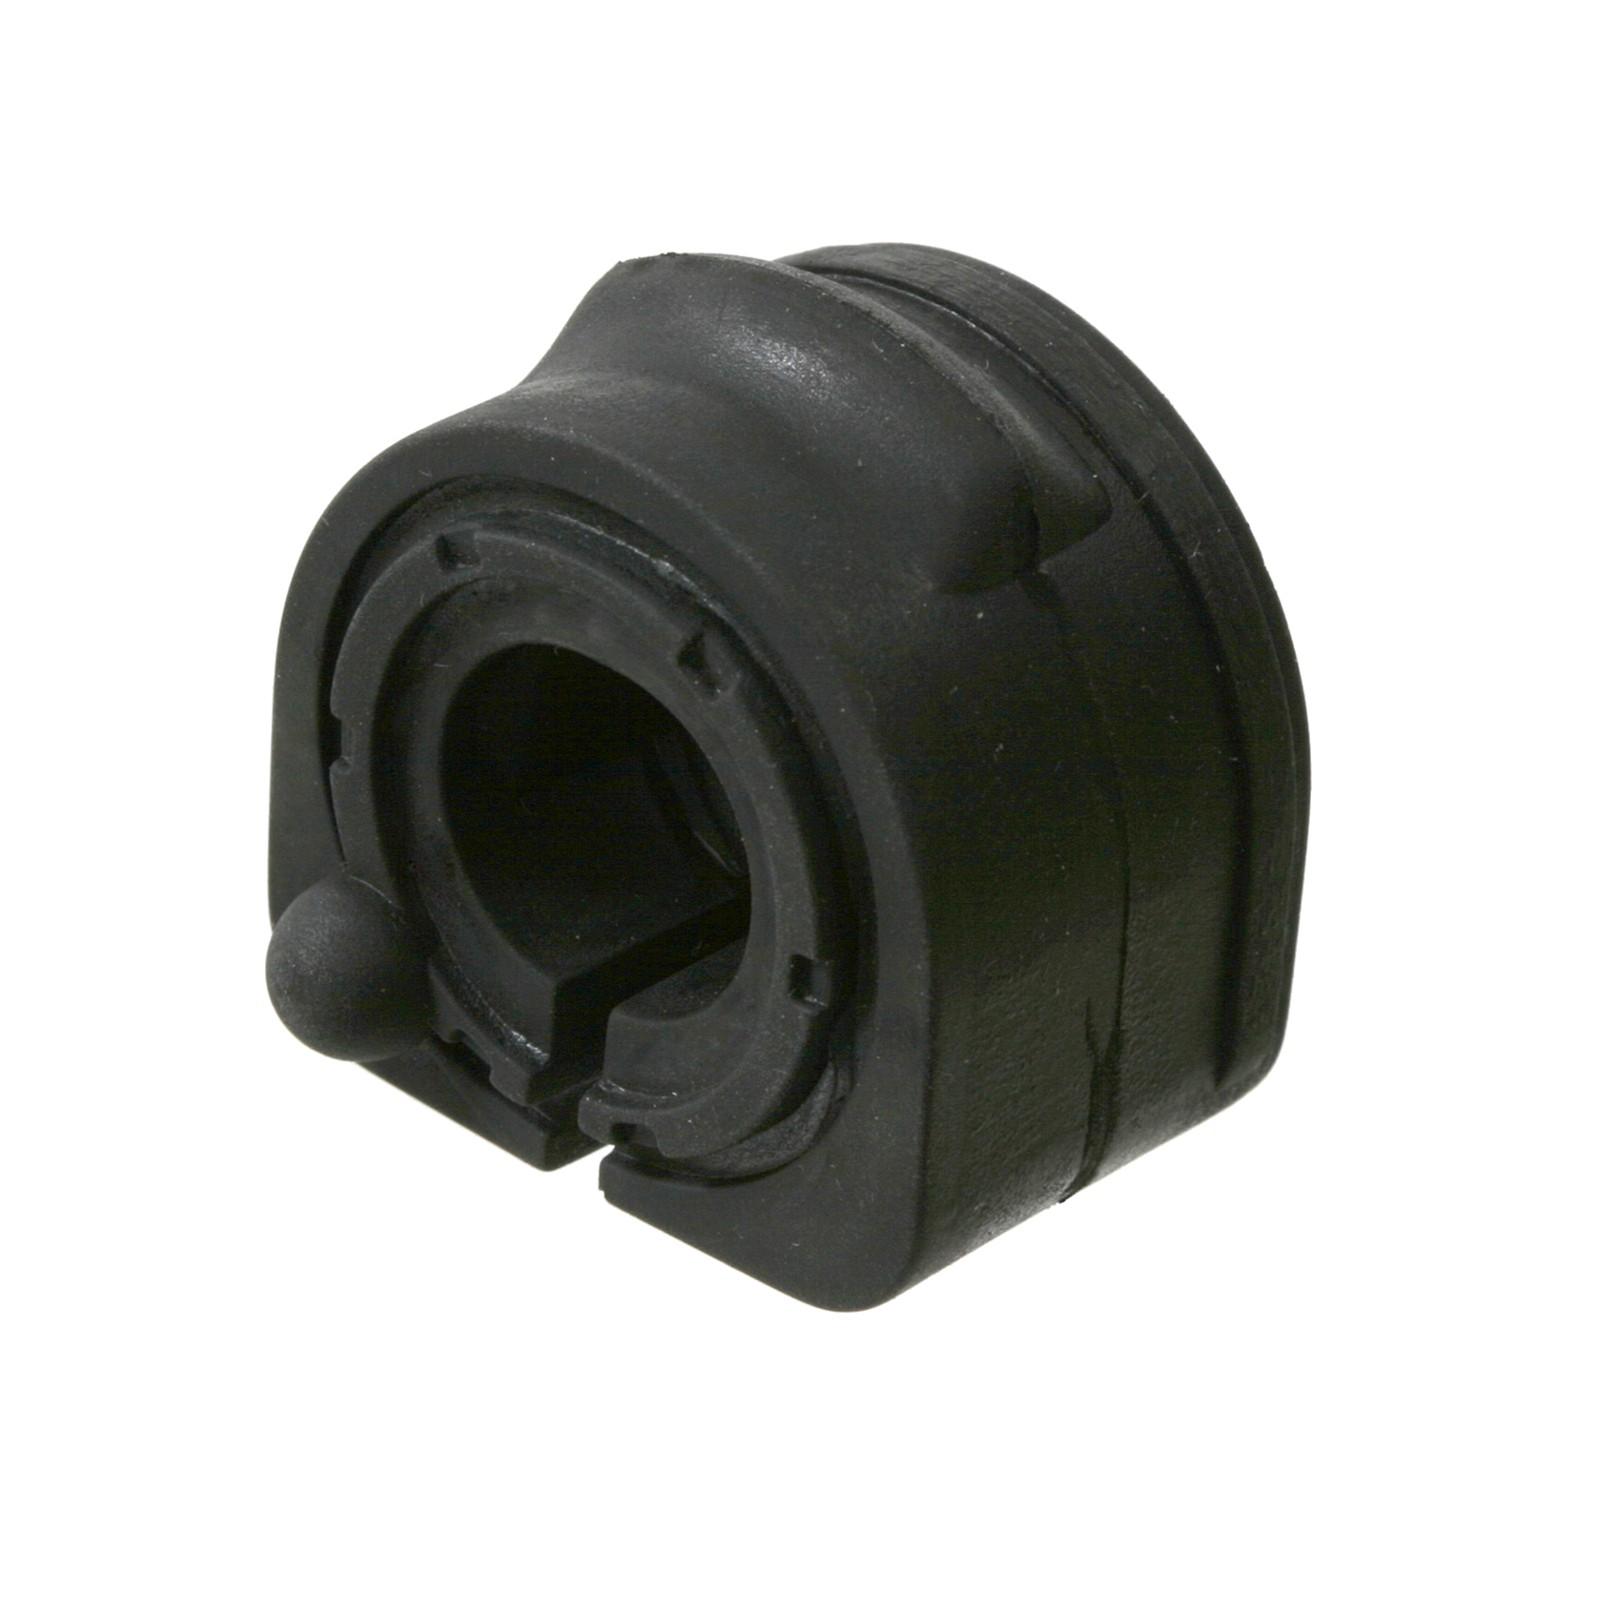 2x FEBI 23125 Stabilisatorlager FORD Focus 1 MK1 hinten 1067976 / 1073249